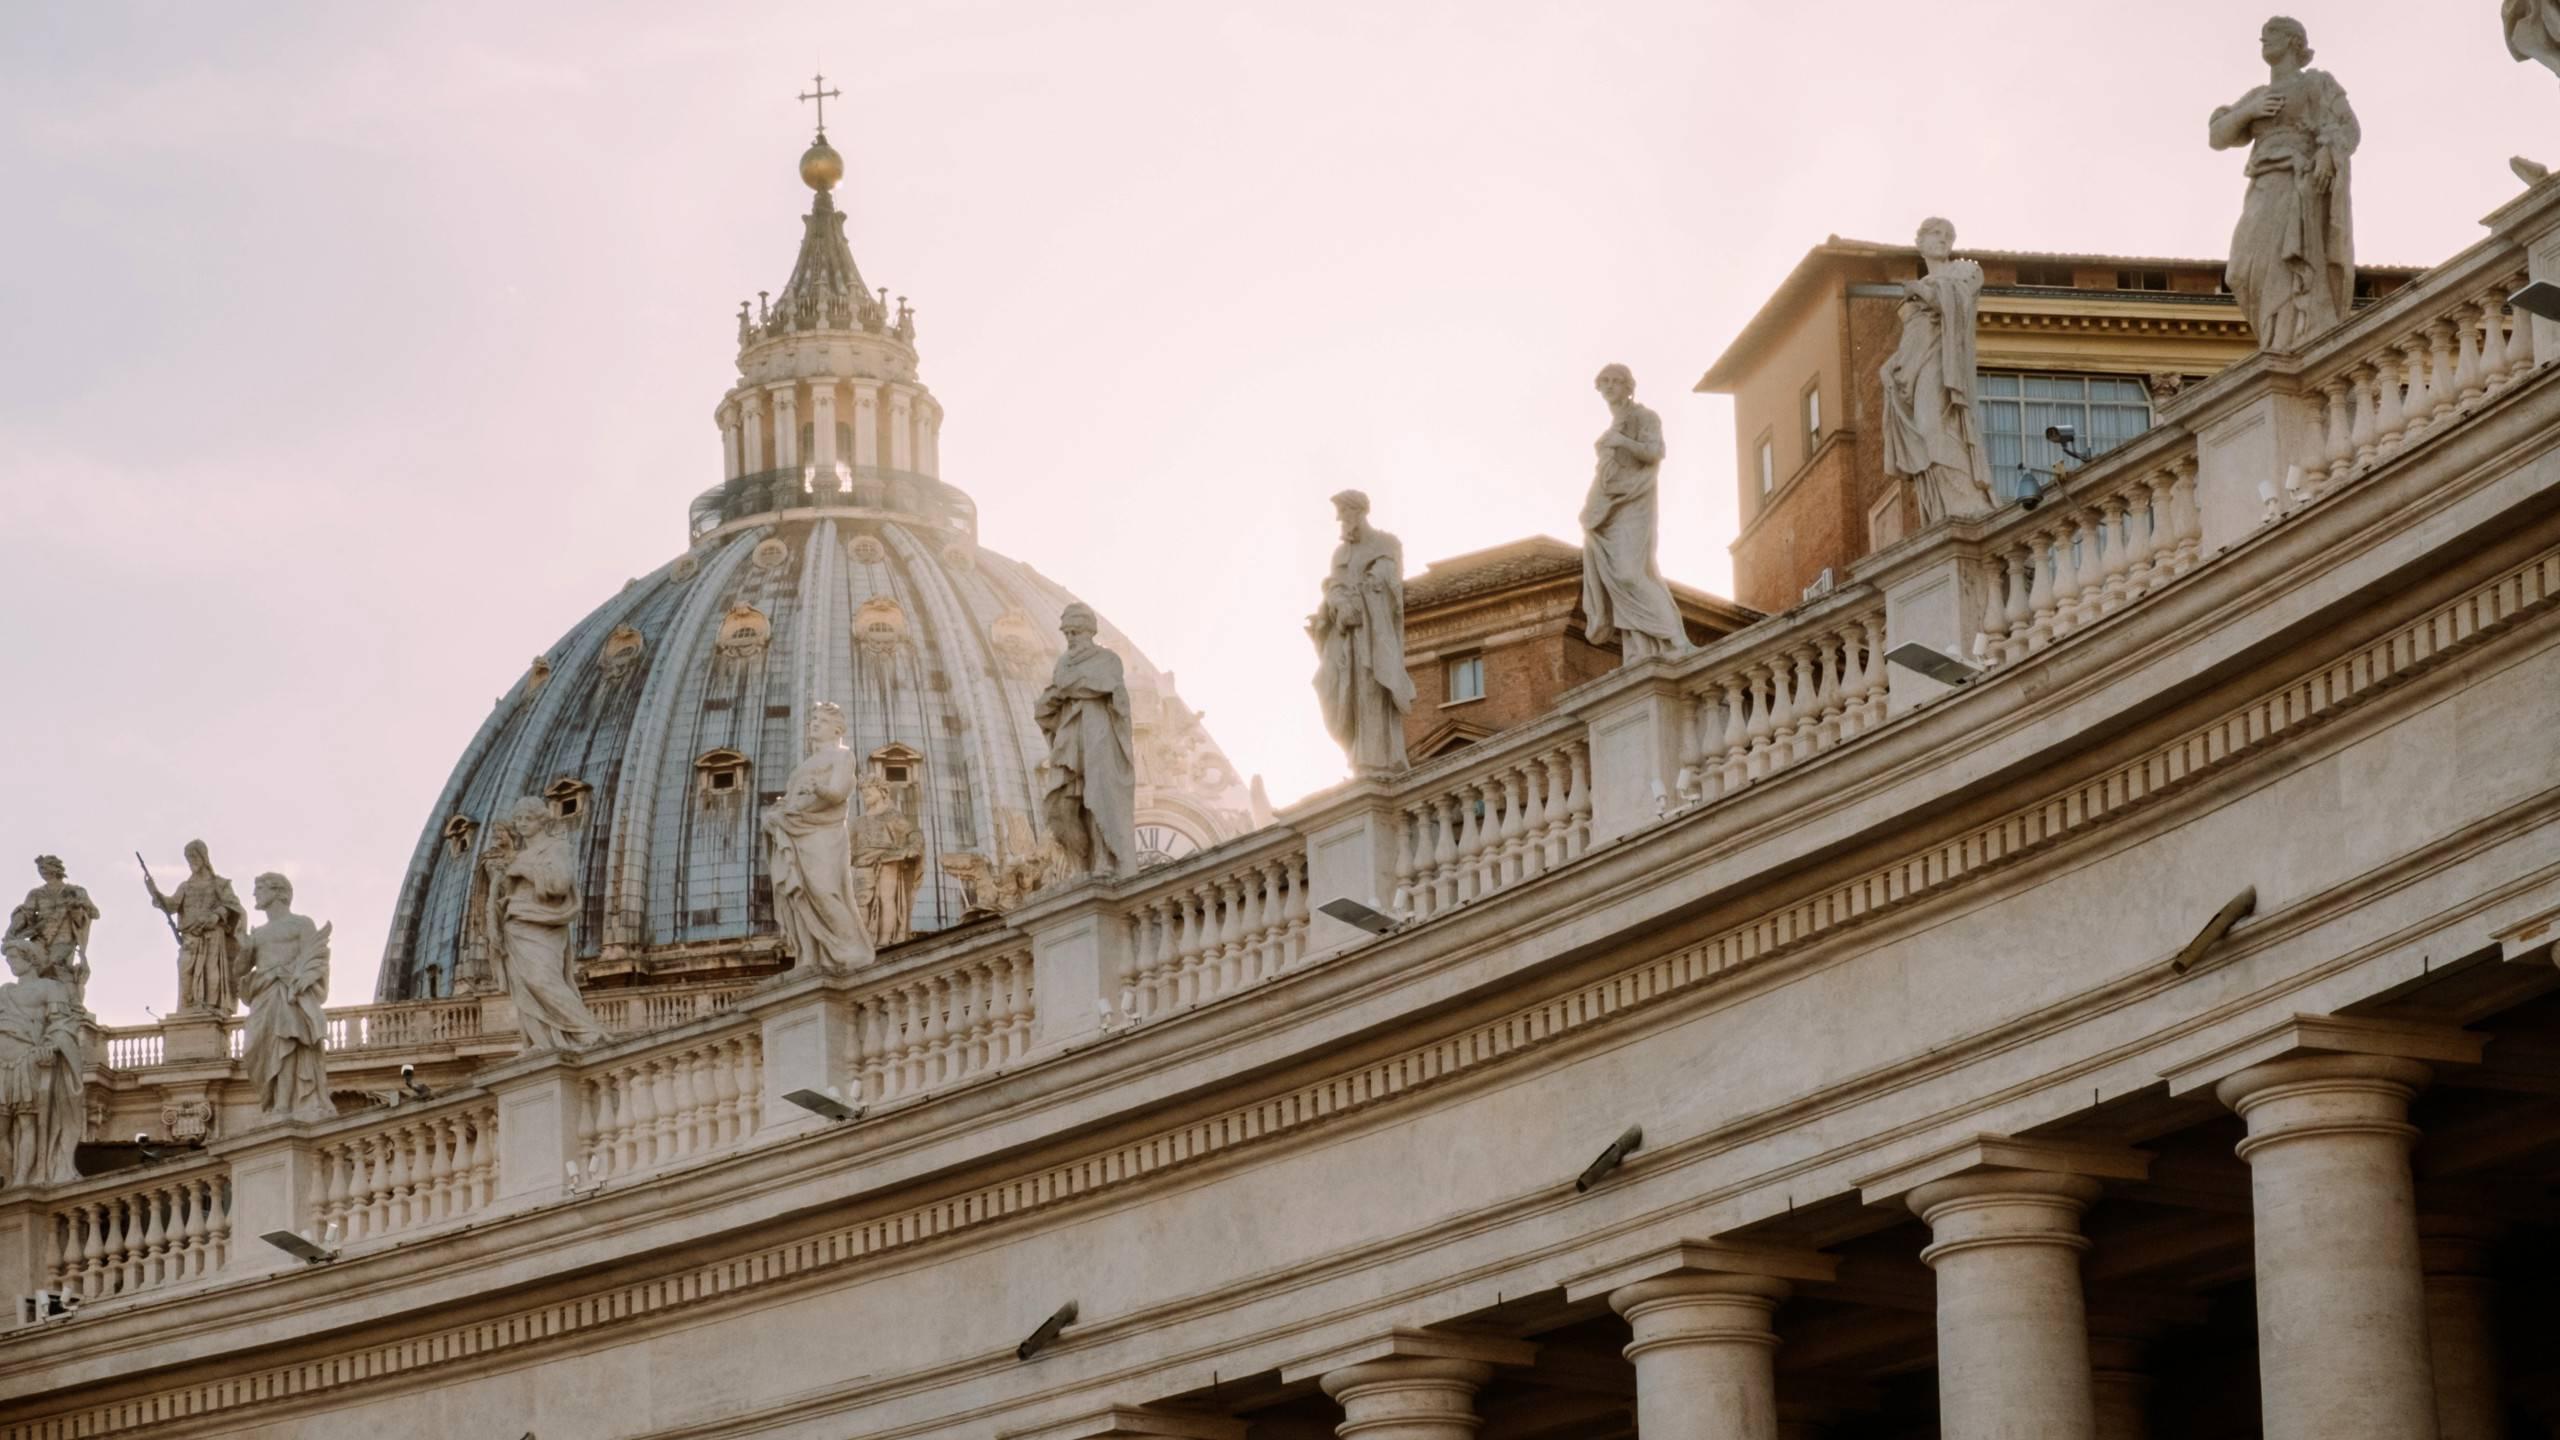 hotel-alessandrino-rome-basilica-of-saint-peter-simone-savoldi-620408-unsplash